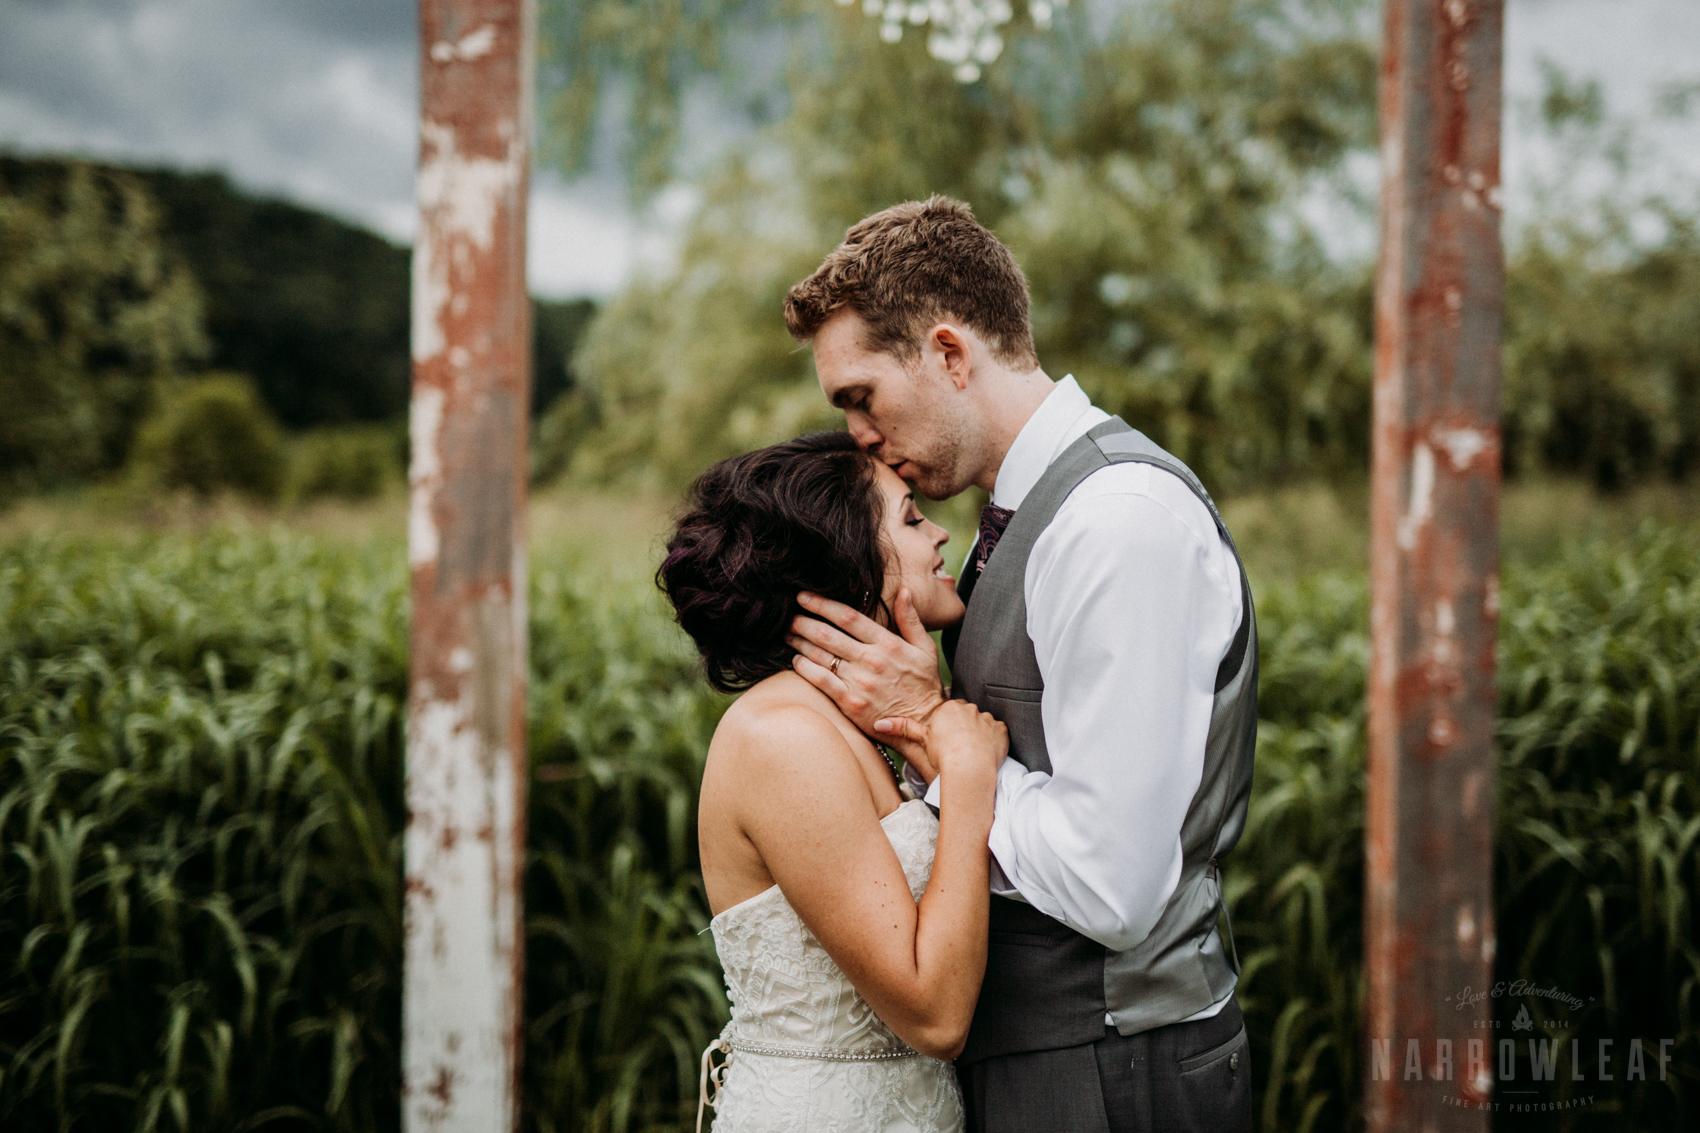 moody-bride-groom-photos-the-hidden-meadow-and-barn-pepin-wi-5.jpg